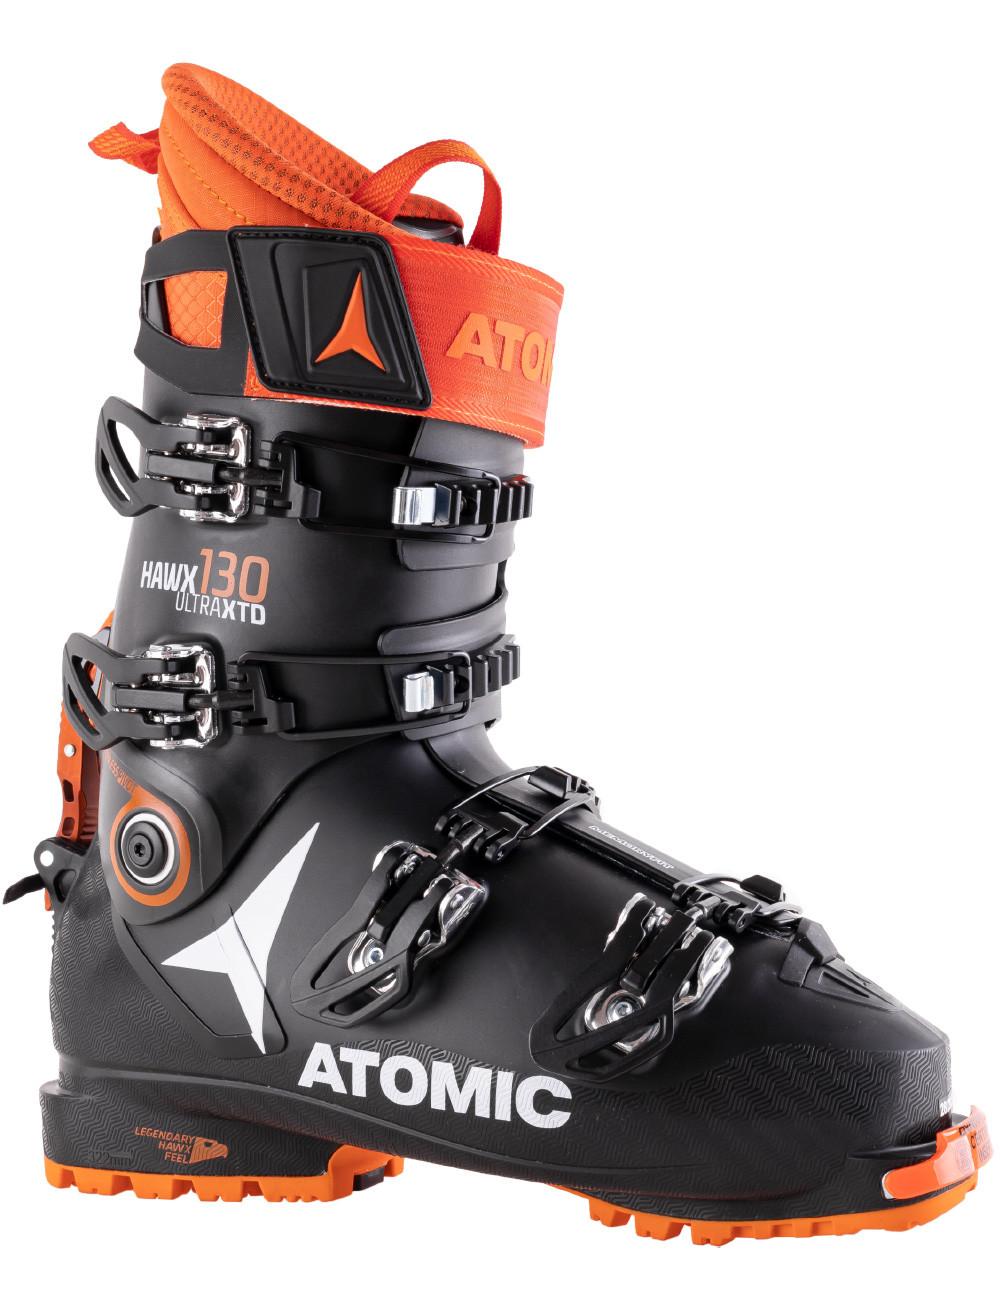 sneakers for cheap 7378c a9d94 Buty narciarskie Atomic Hawx Ultra XTD 130